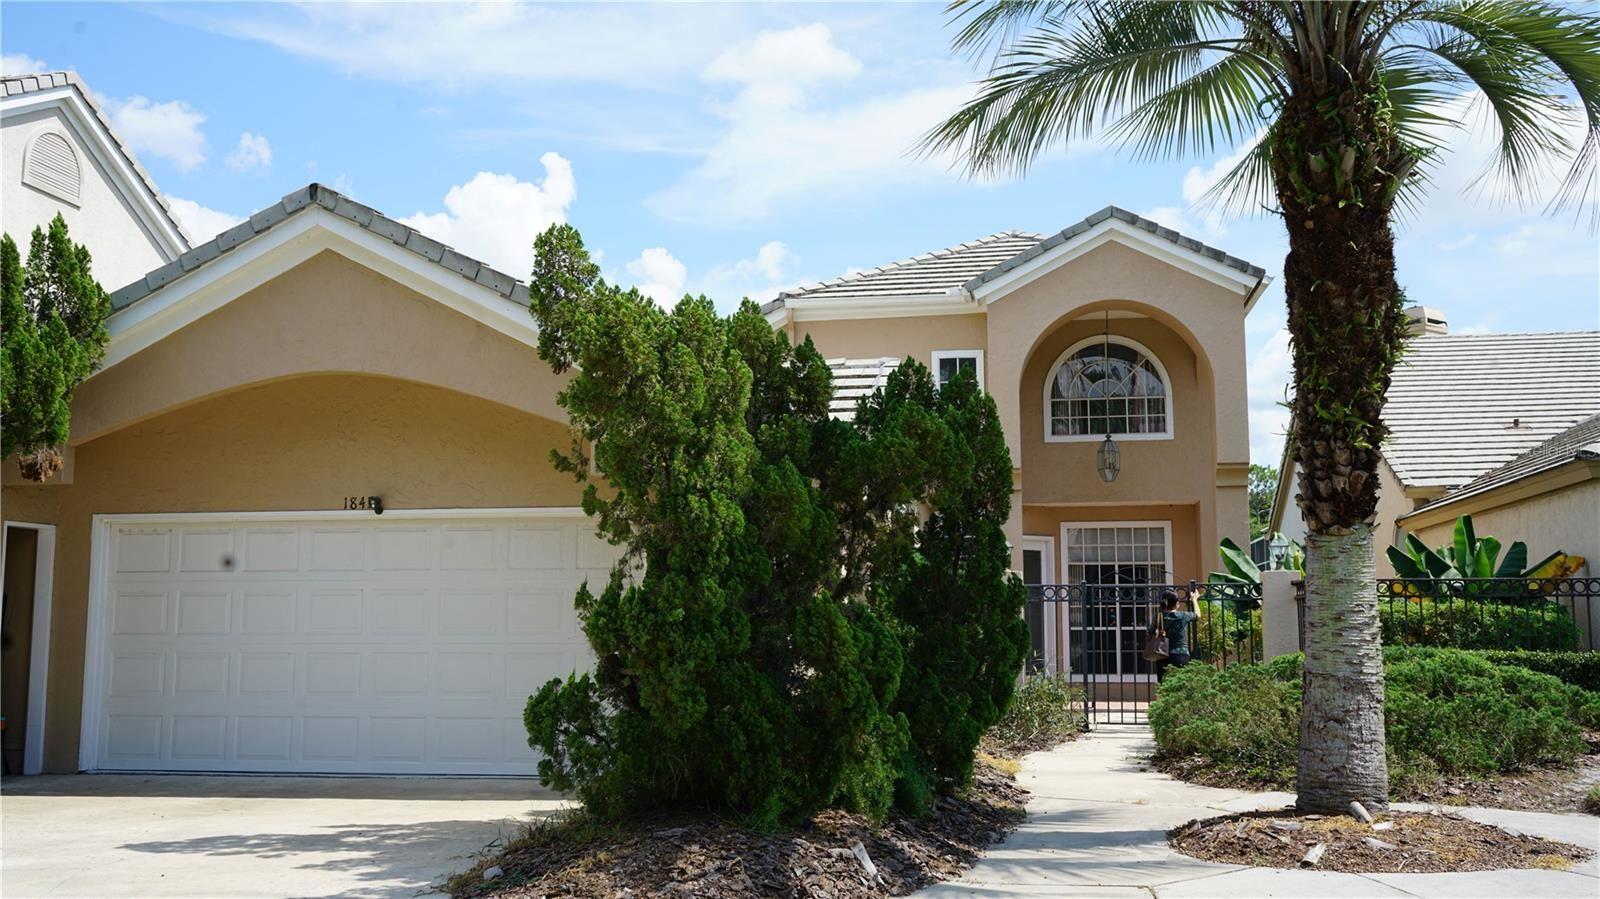 1845 BAILLIE GLASS LANE, Orlando, FL 32835 - MLS#: O5969577